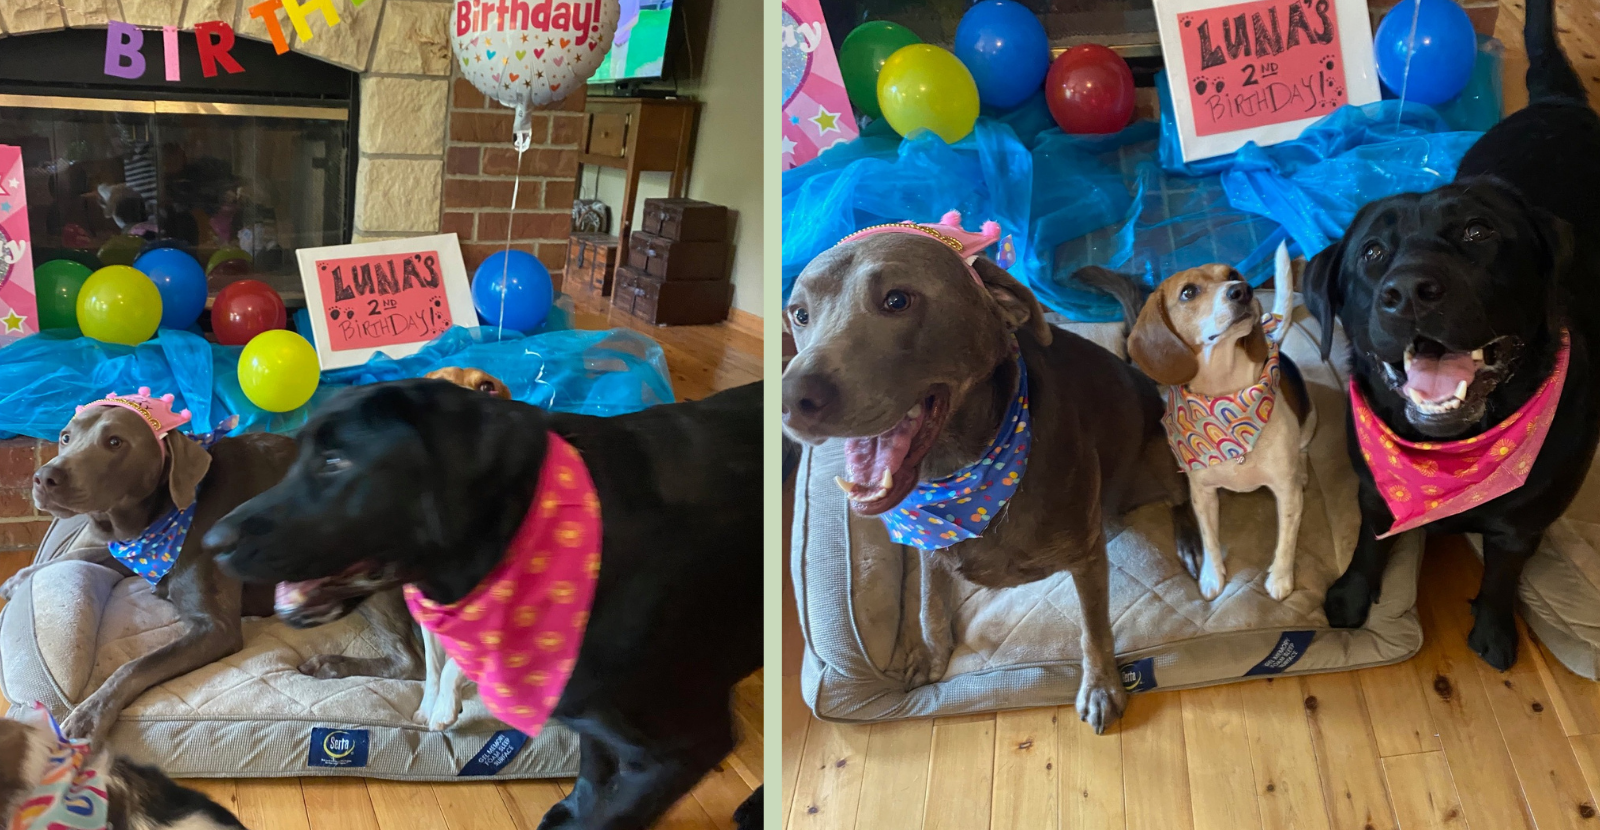 Birthday collage 4